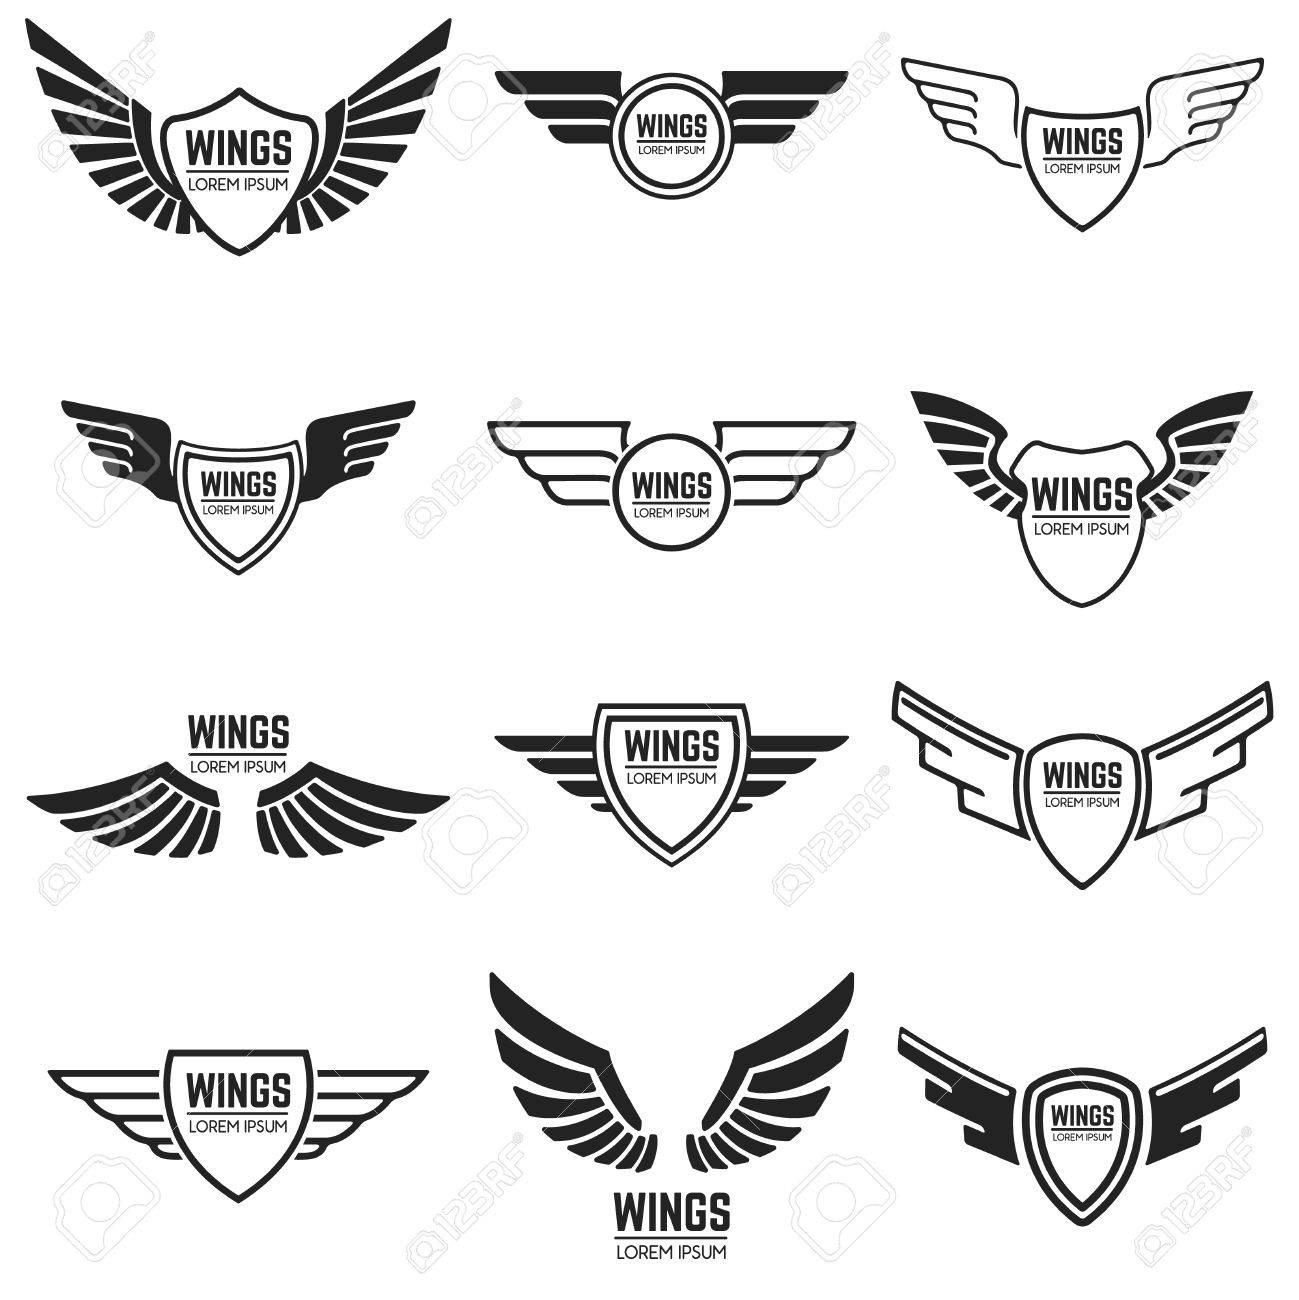 Winged emblems, frames, icons, angel and phoenix wings. Design elements for logo, emblem, sign, brand mark. Vector illustration. - 73482134